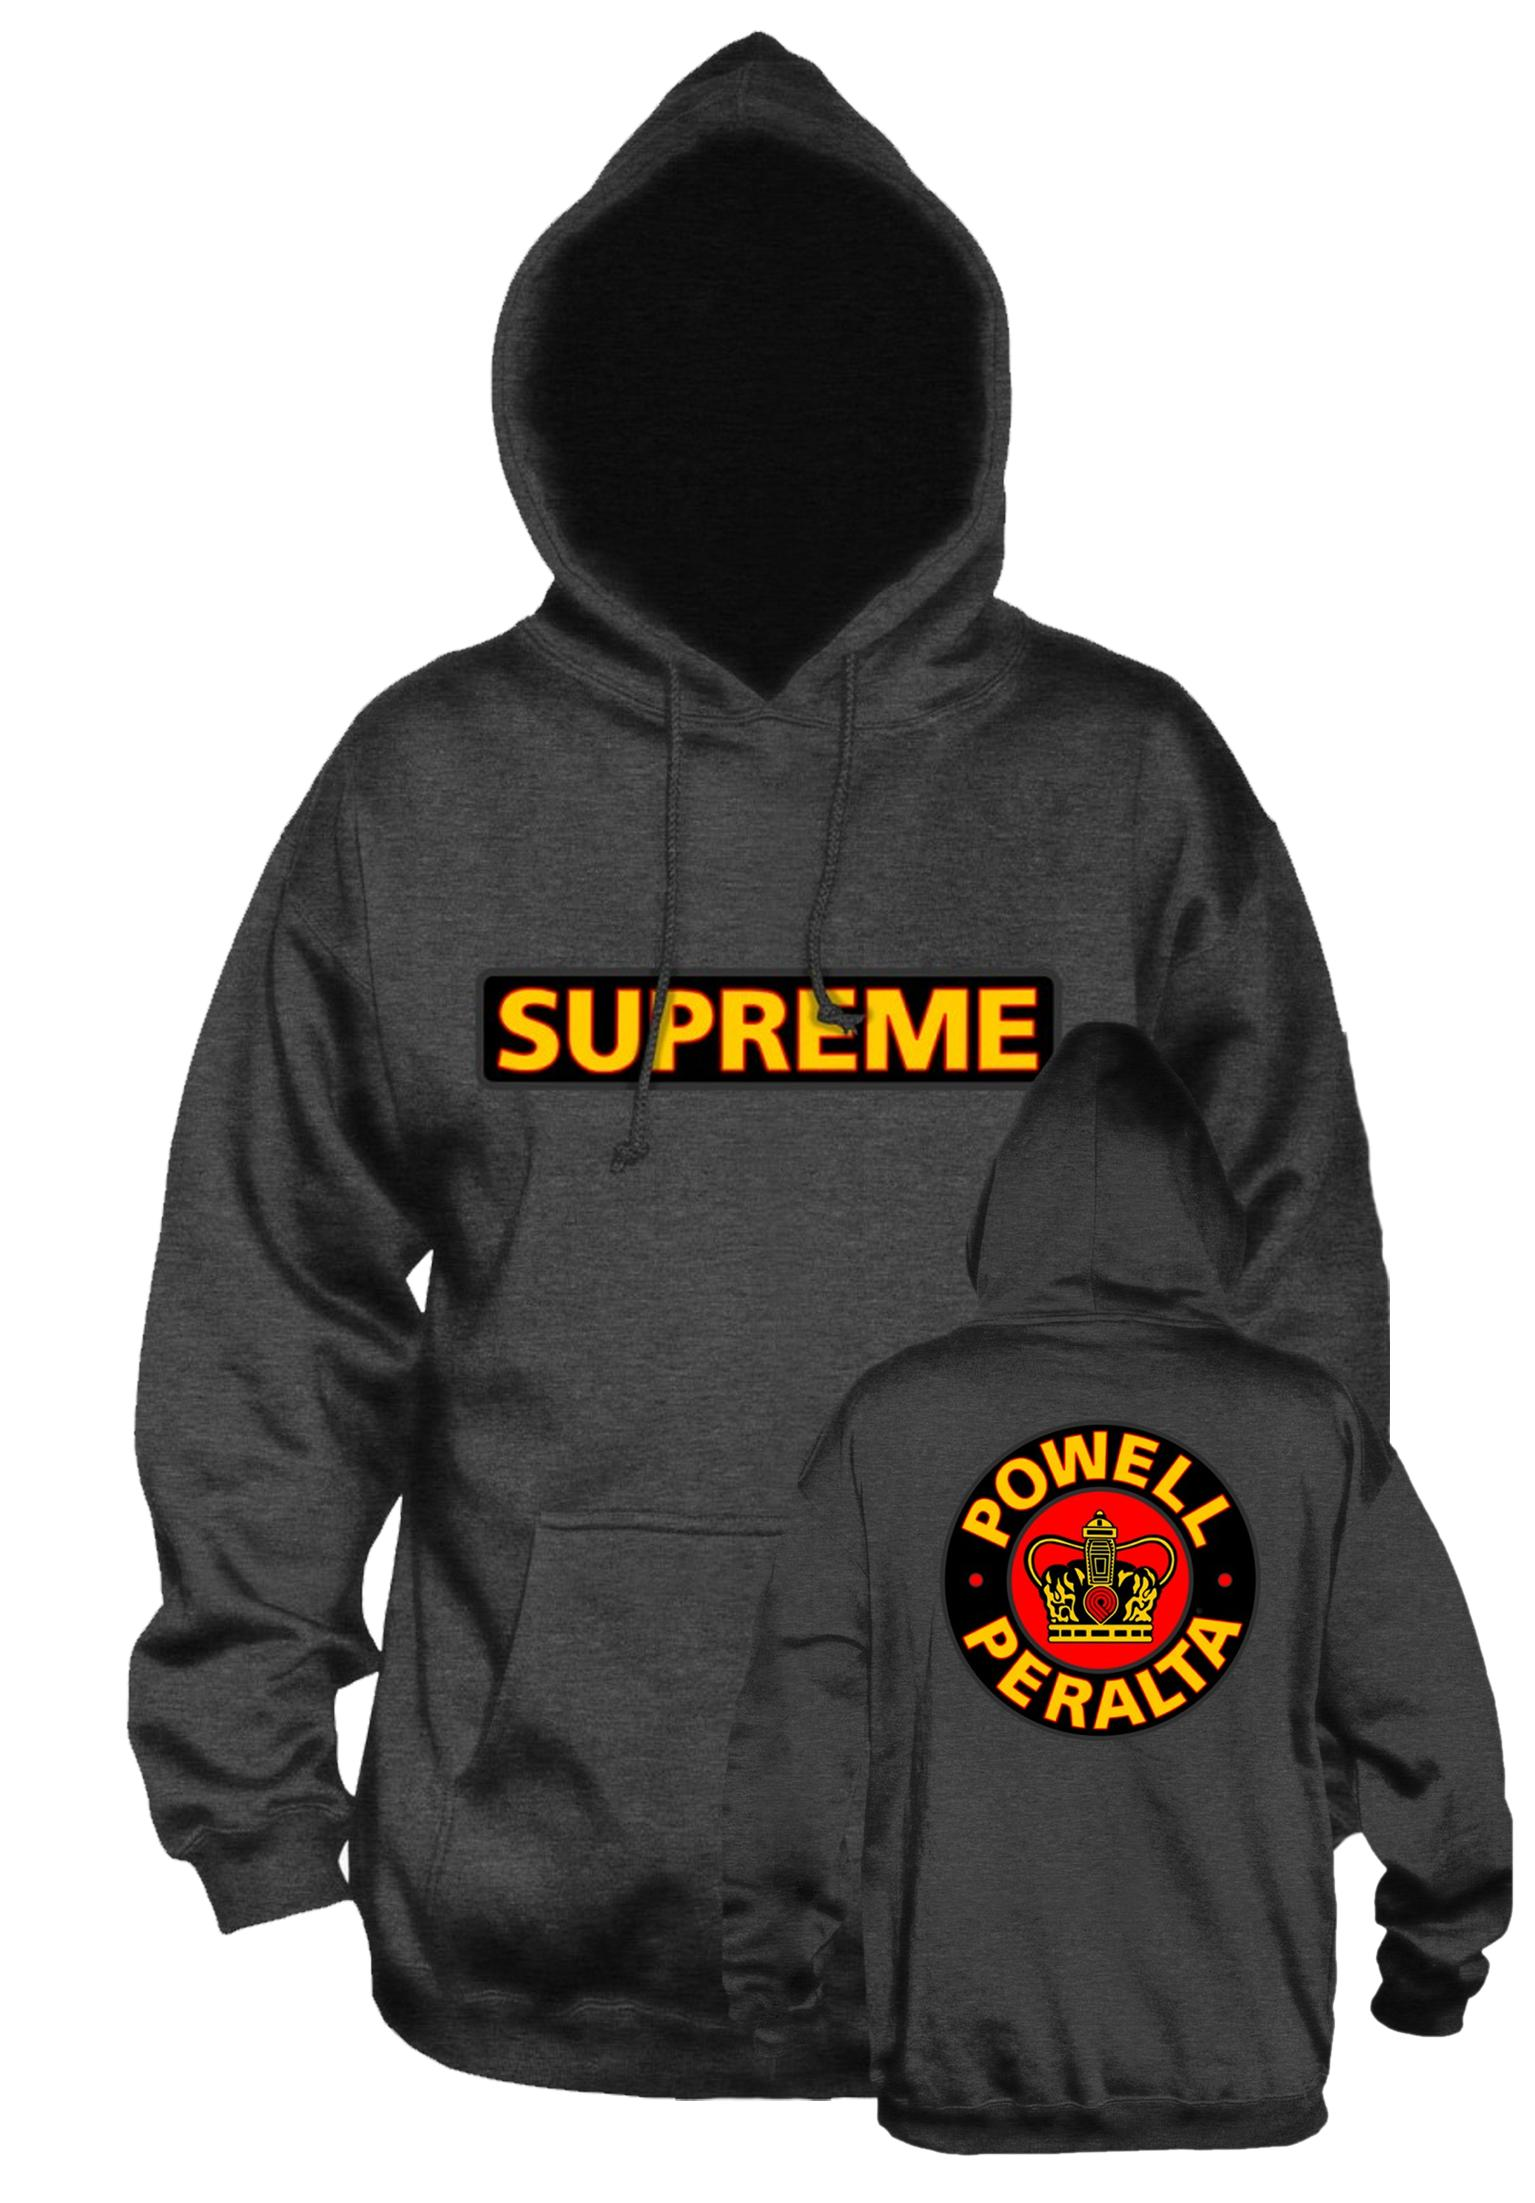 6312e29ec537 Supreme Medium Weight Powell-Peralta Hoodies in gunmetal-grey for Men